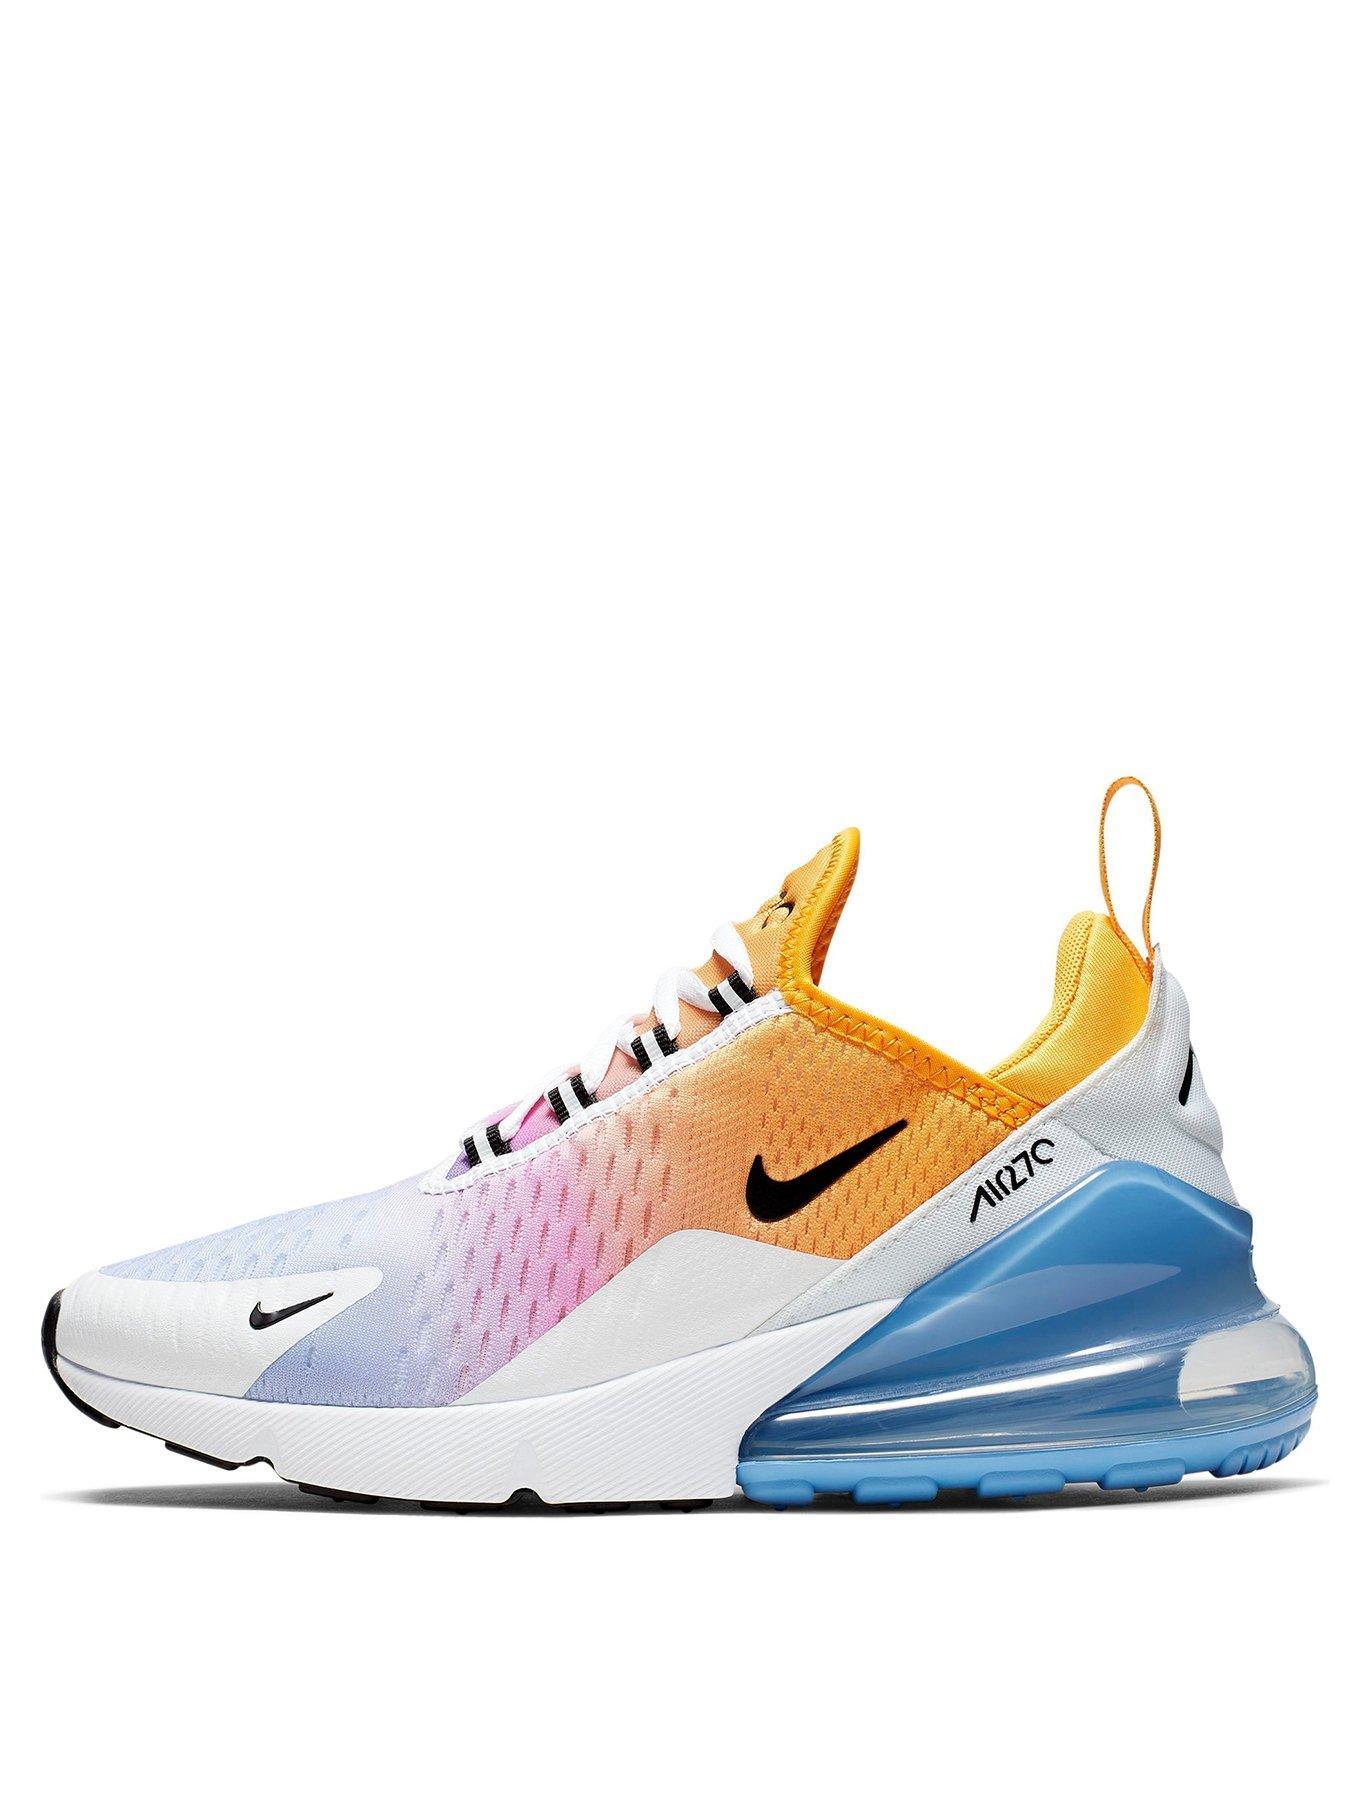 Sports & leisure | Nike | littlewoodsireland.ie